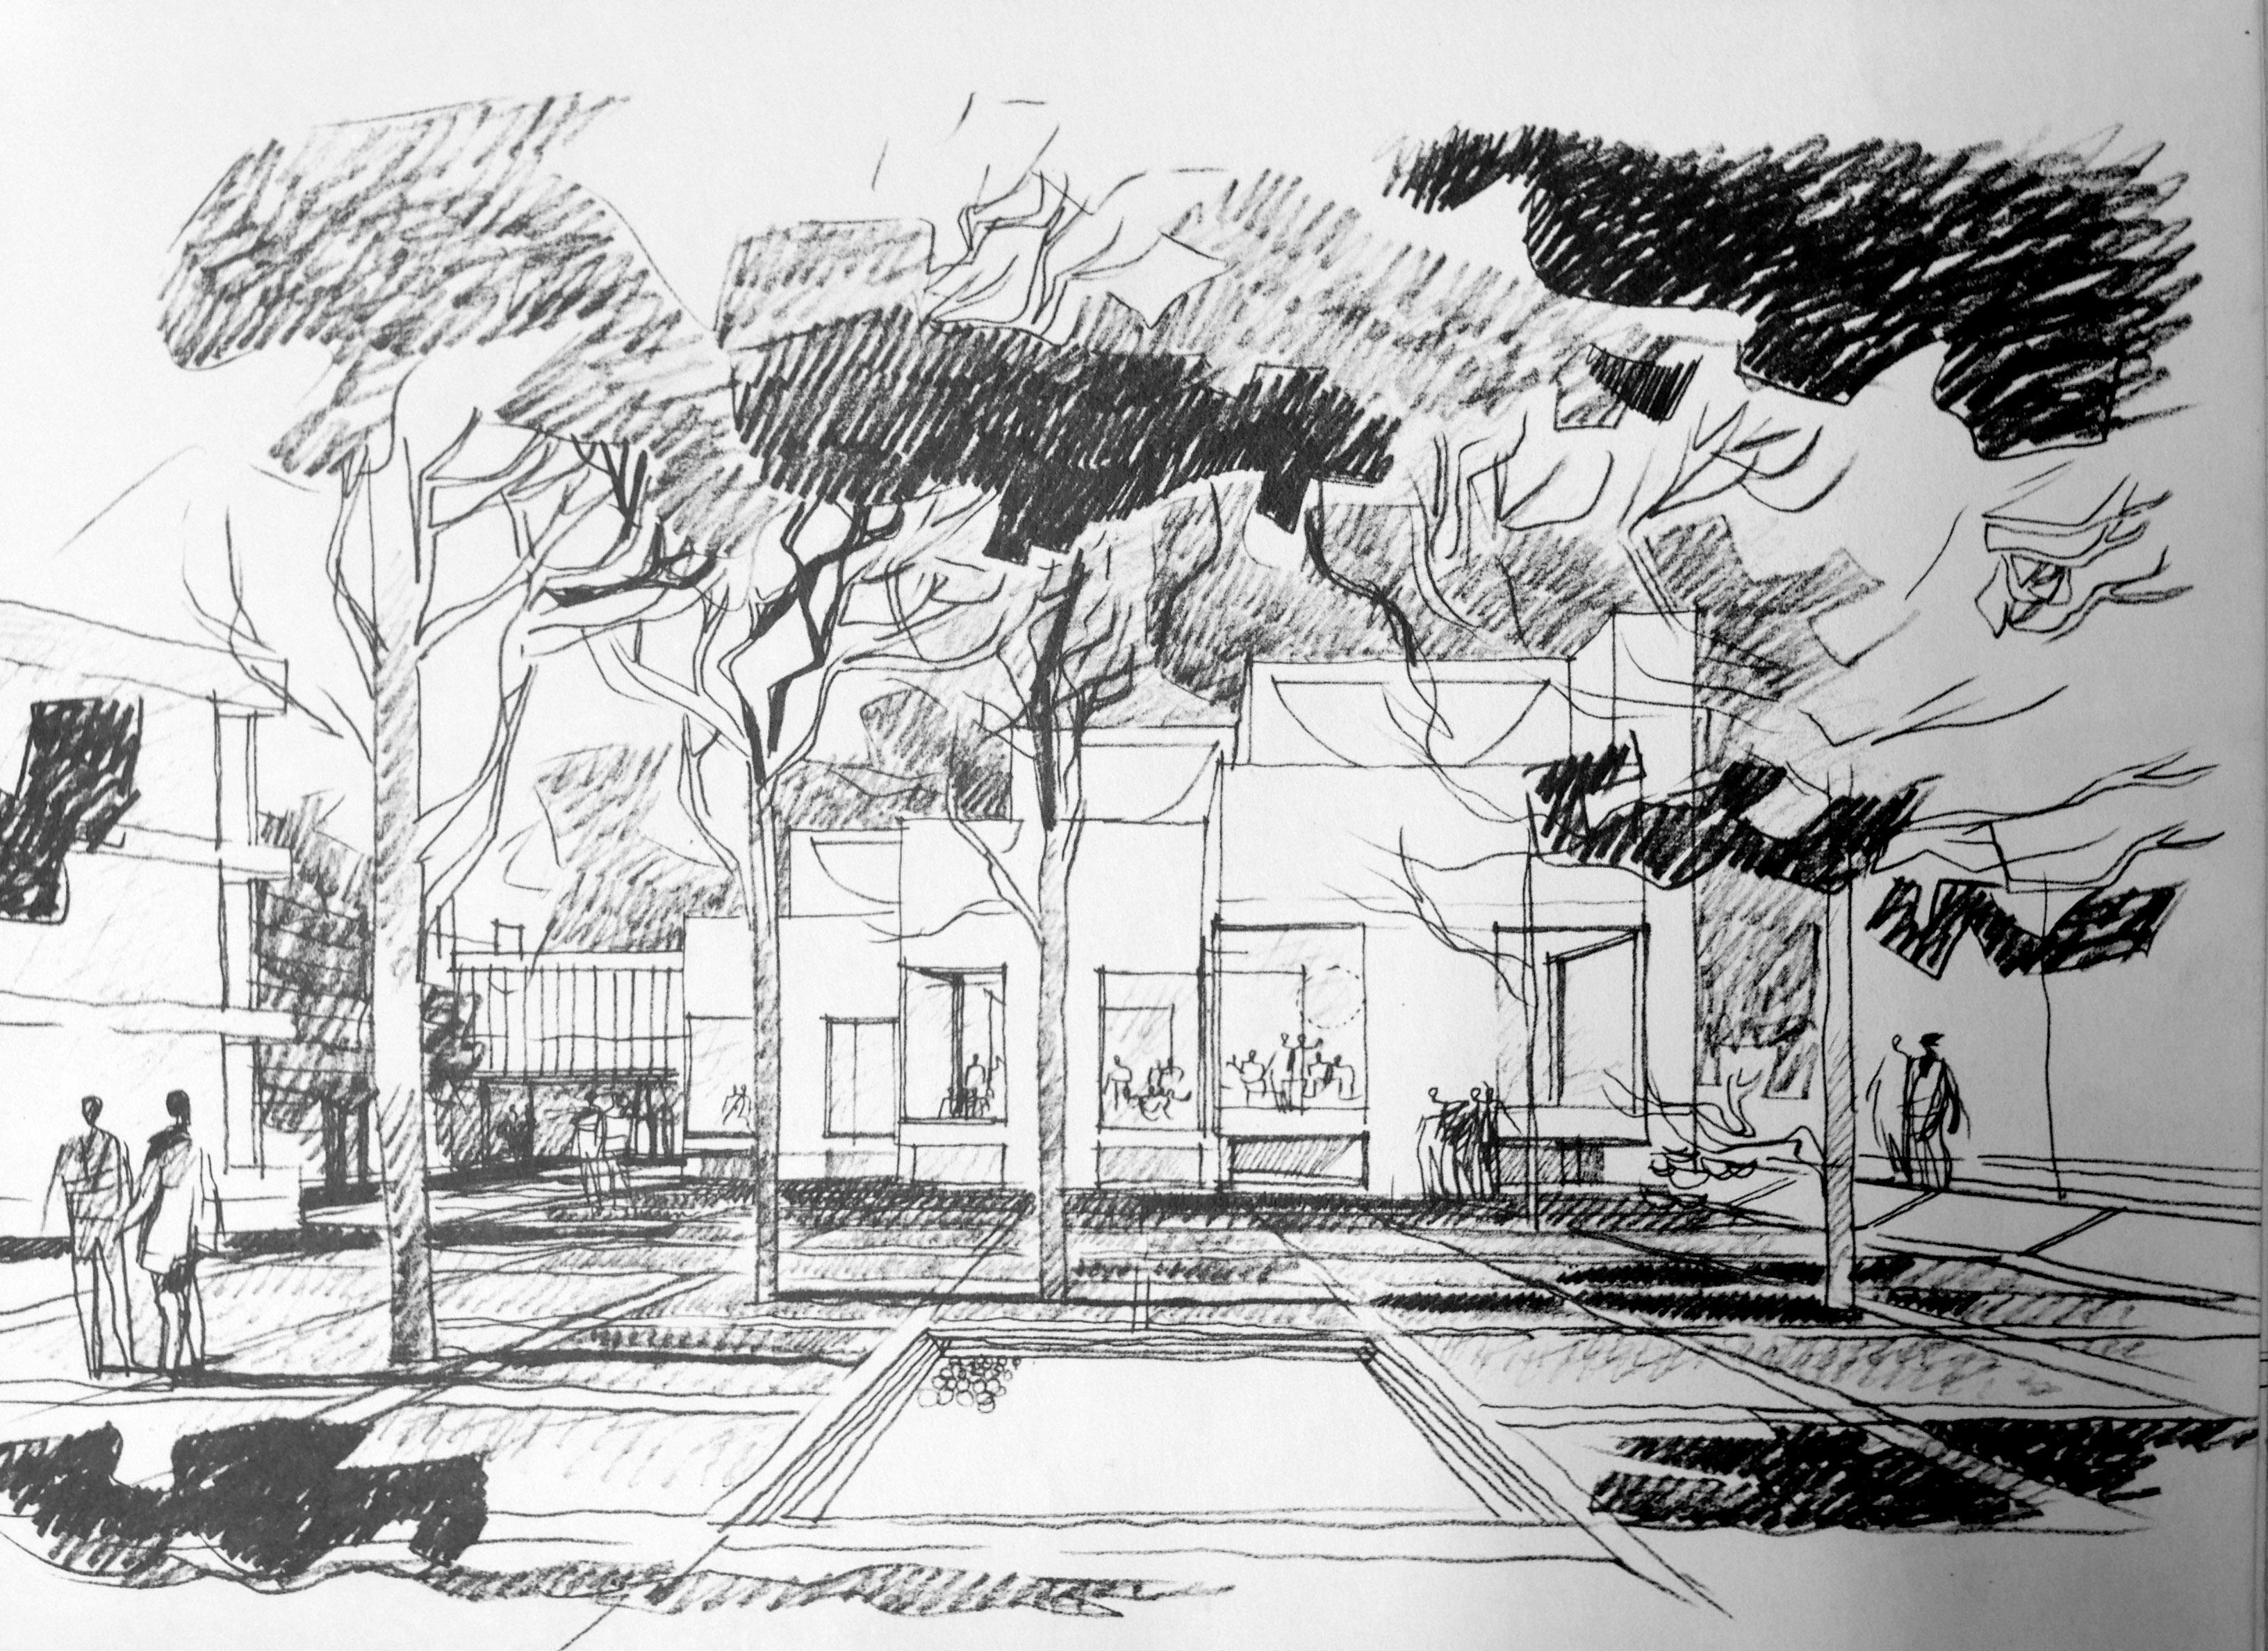 Libros sobre dibujo de arquitectura an lisis de formas for 5 tecnicas de la arquitectura